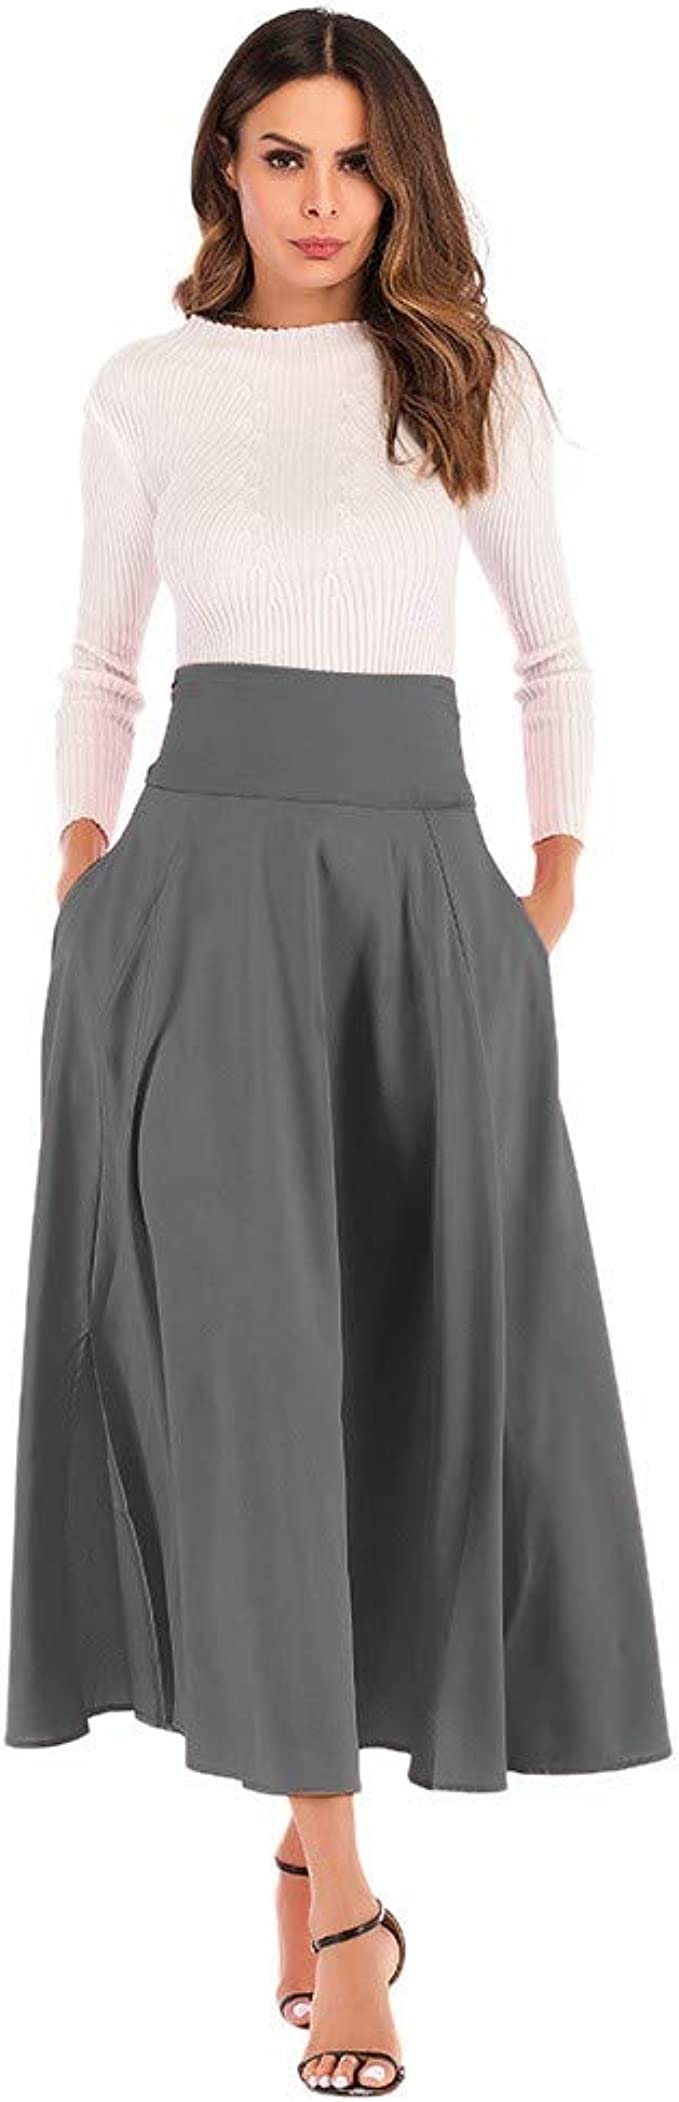 EUZeo_Robe Falda Larga para Mujer, Estilo Vintage, Elegante ...